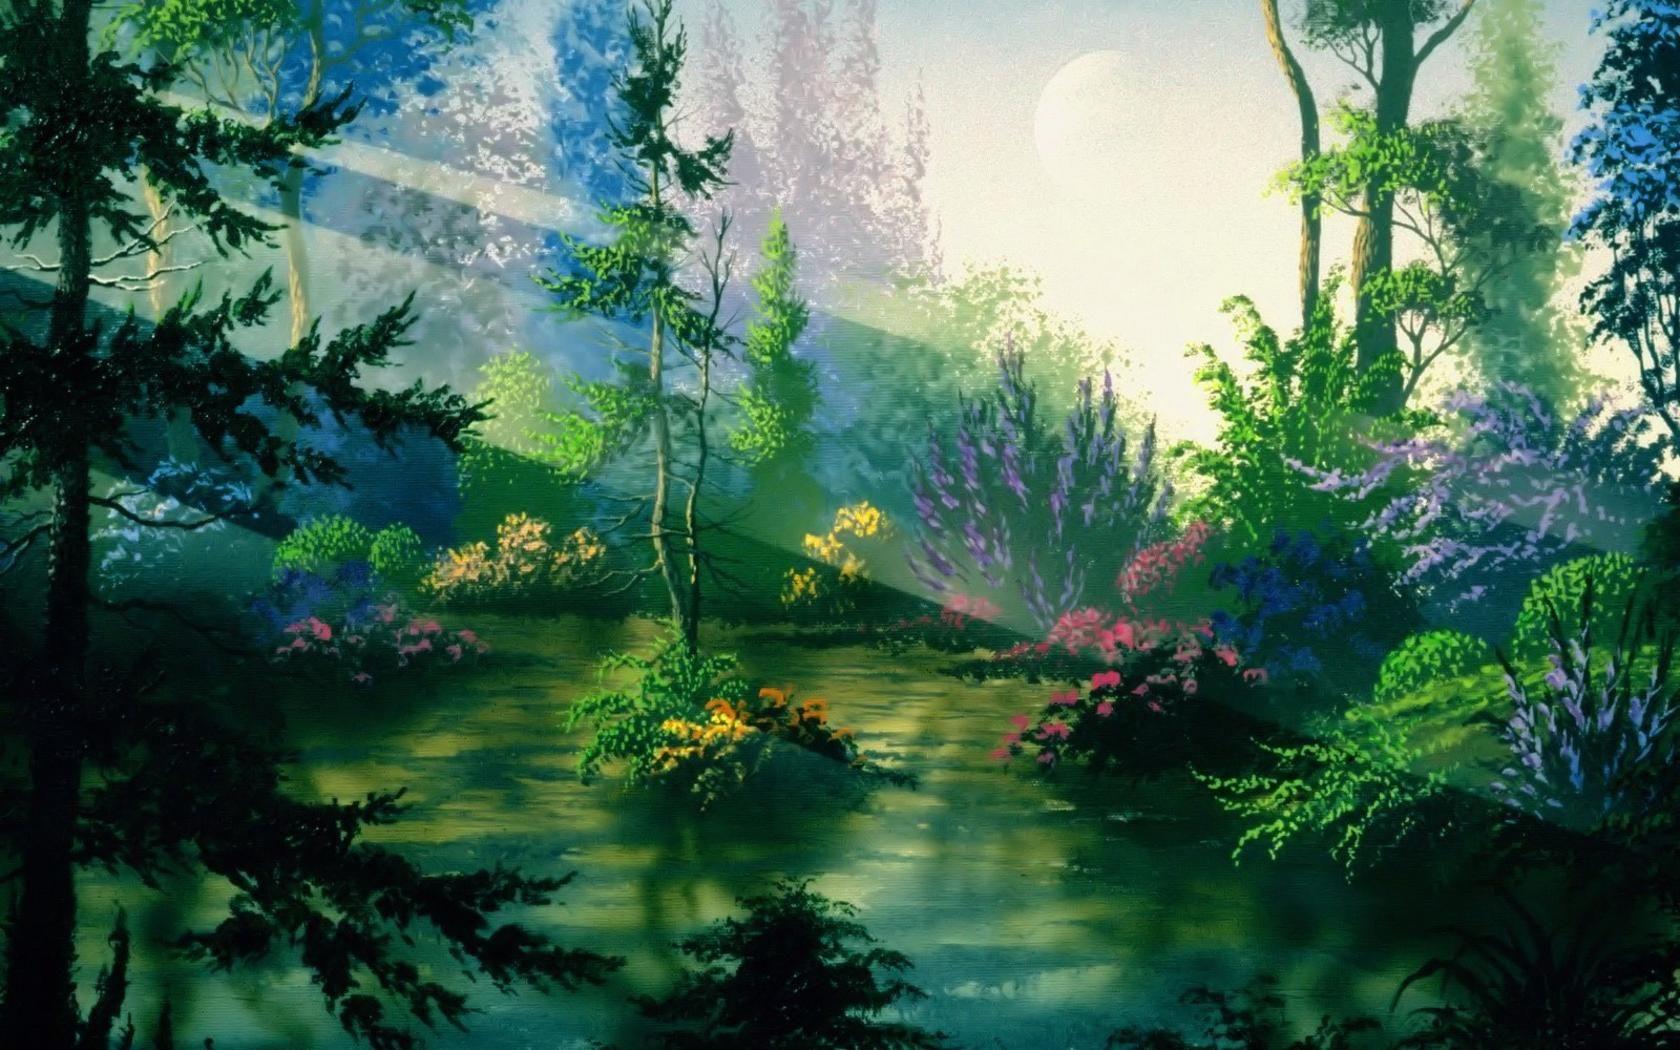 fantasy wallpaper women hd desktop | fantasy, widescreen, forest